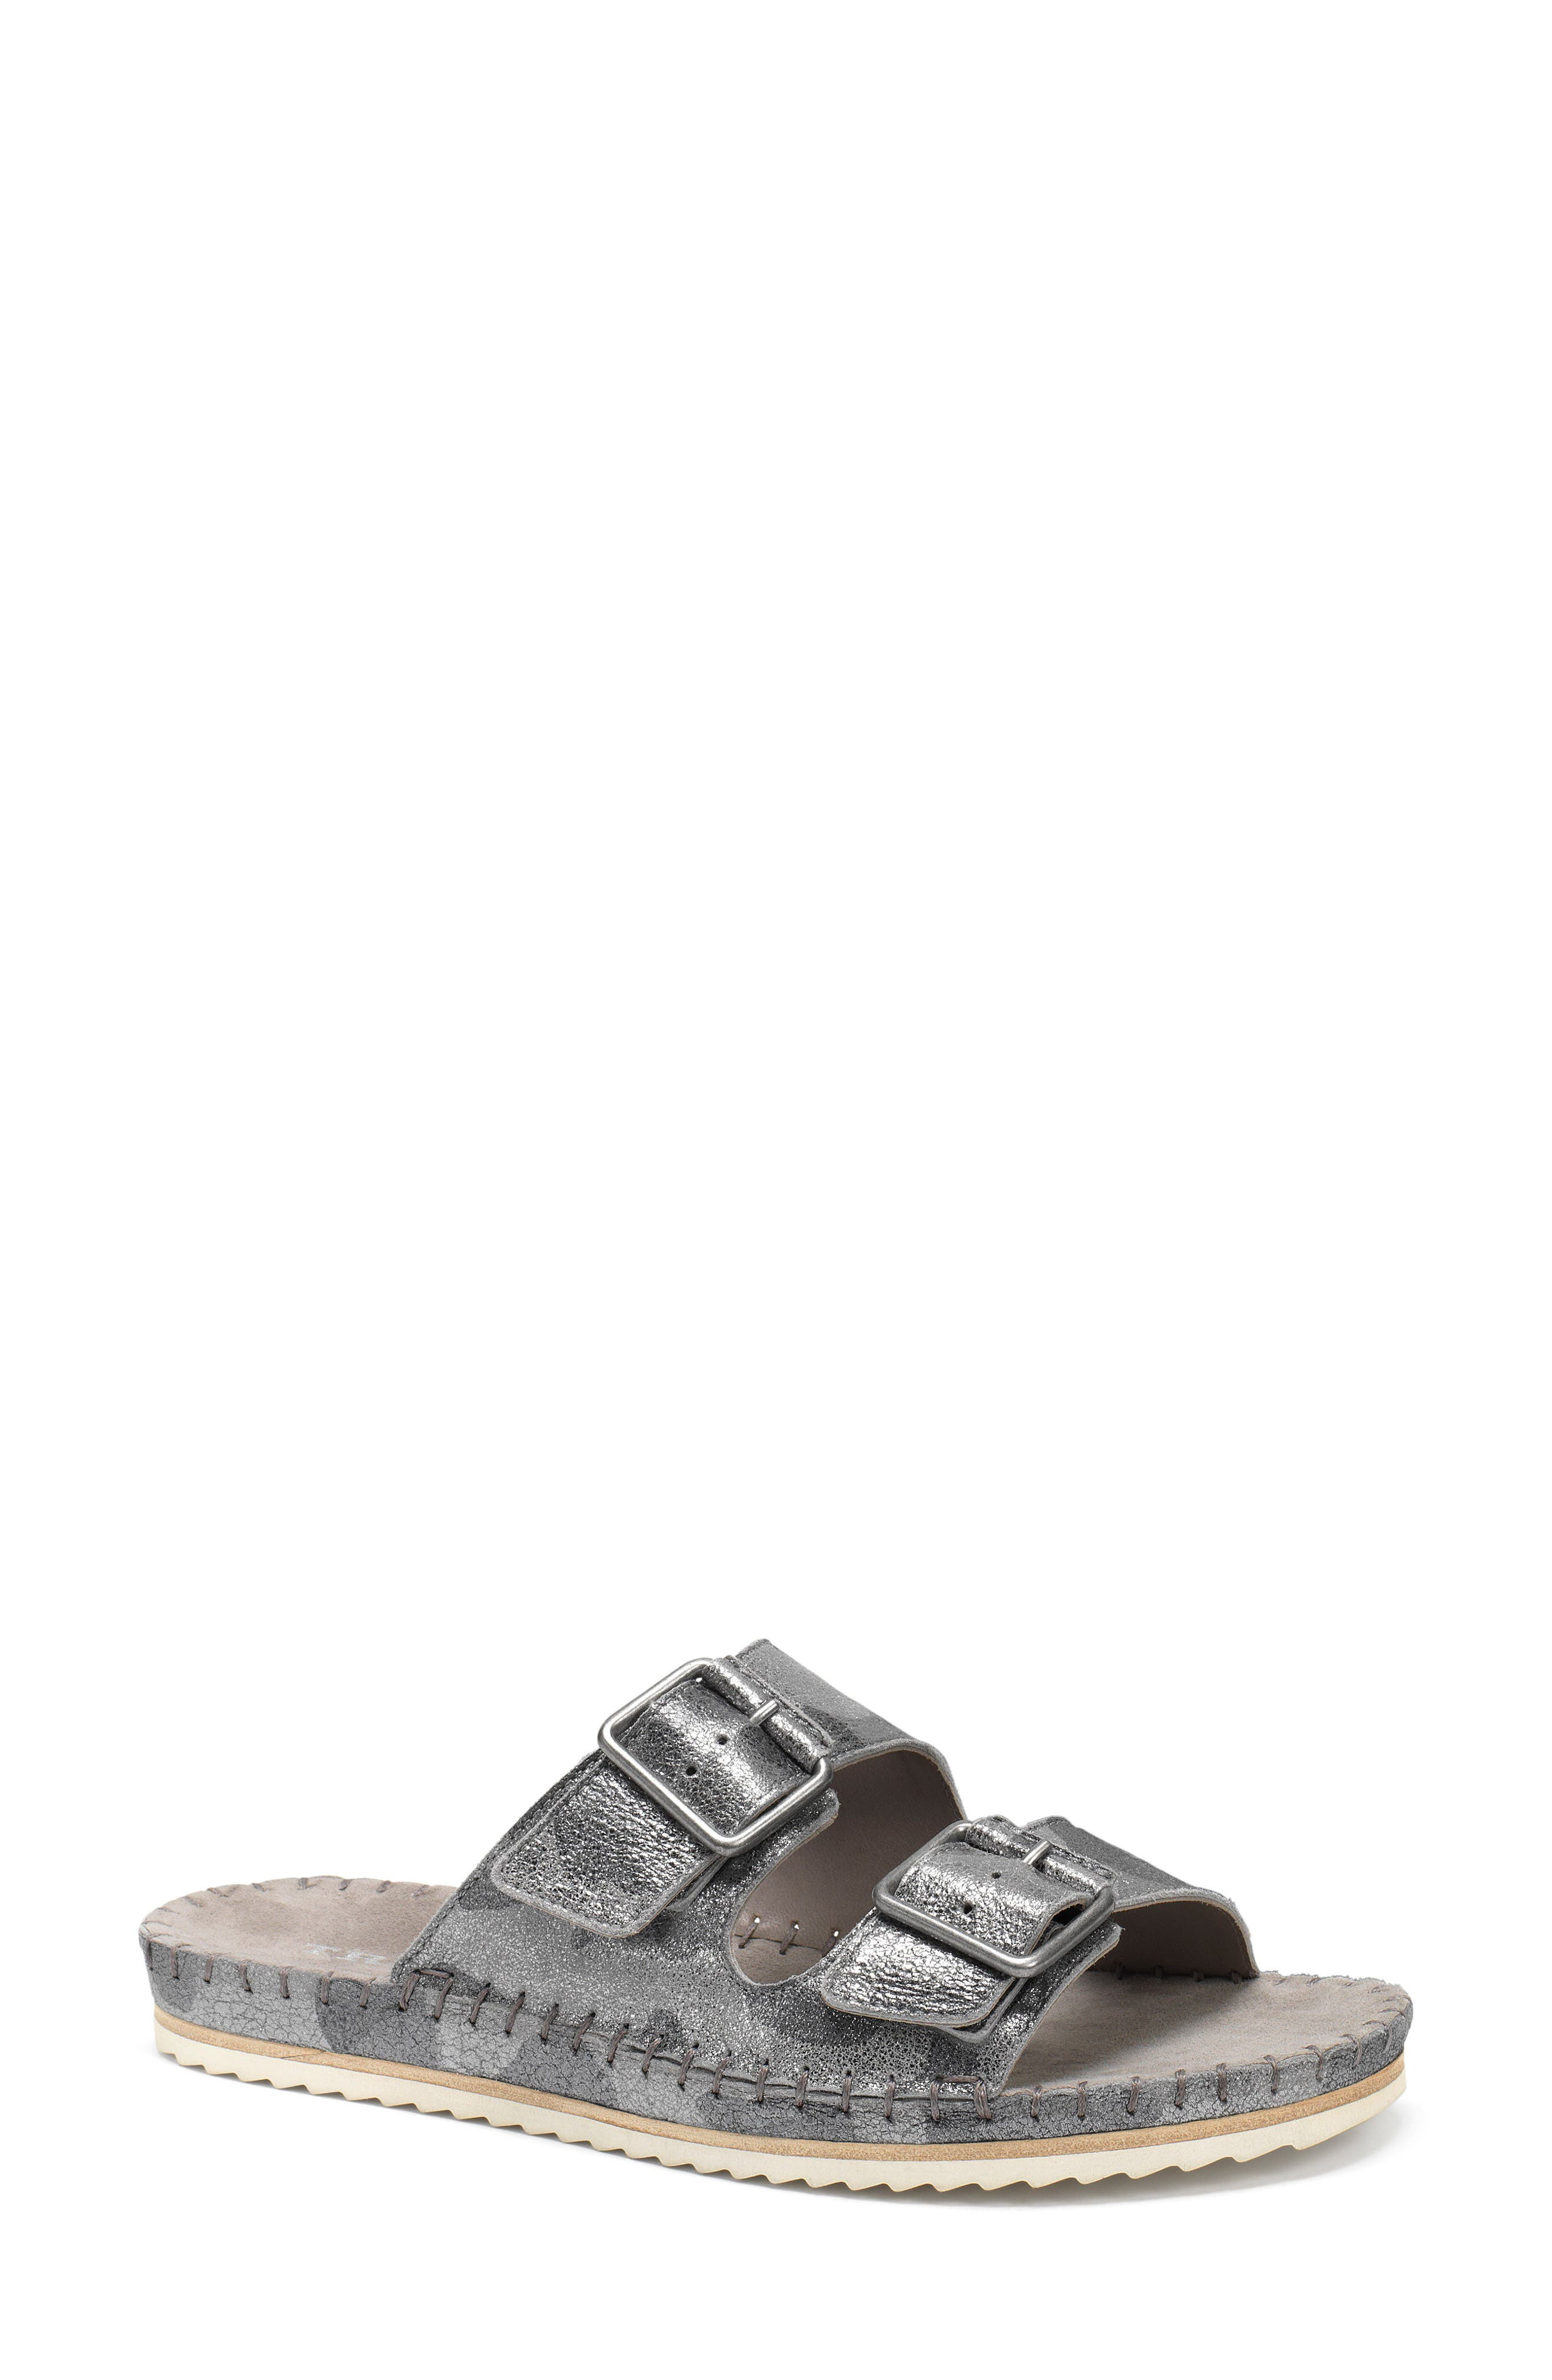 Carli Slide Sandal,                             Main thumbnail 1, color,                             Pewter Camo Metallic Suede